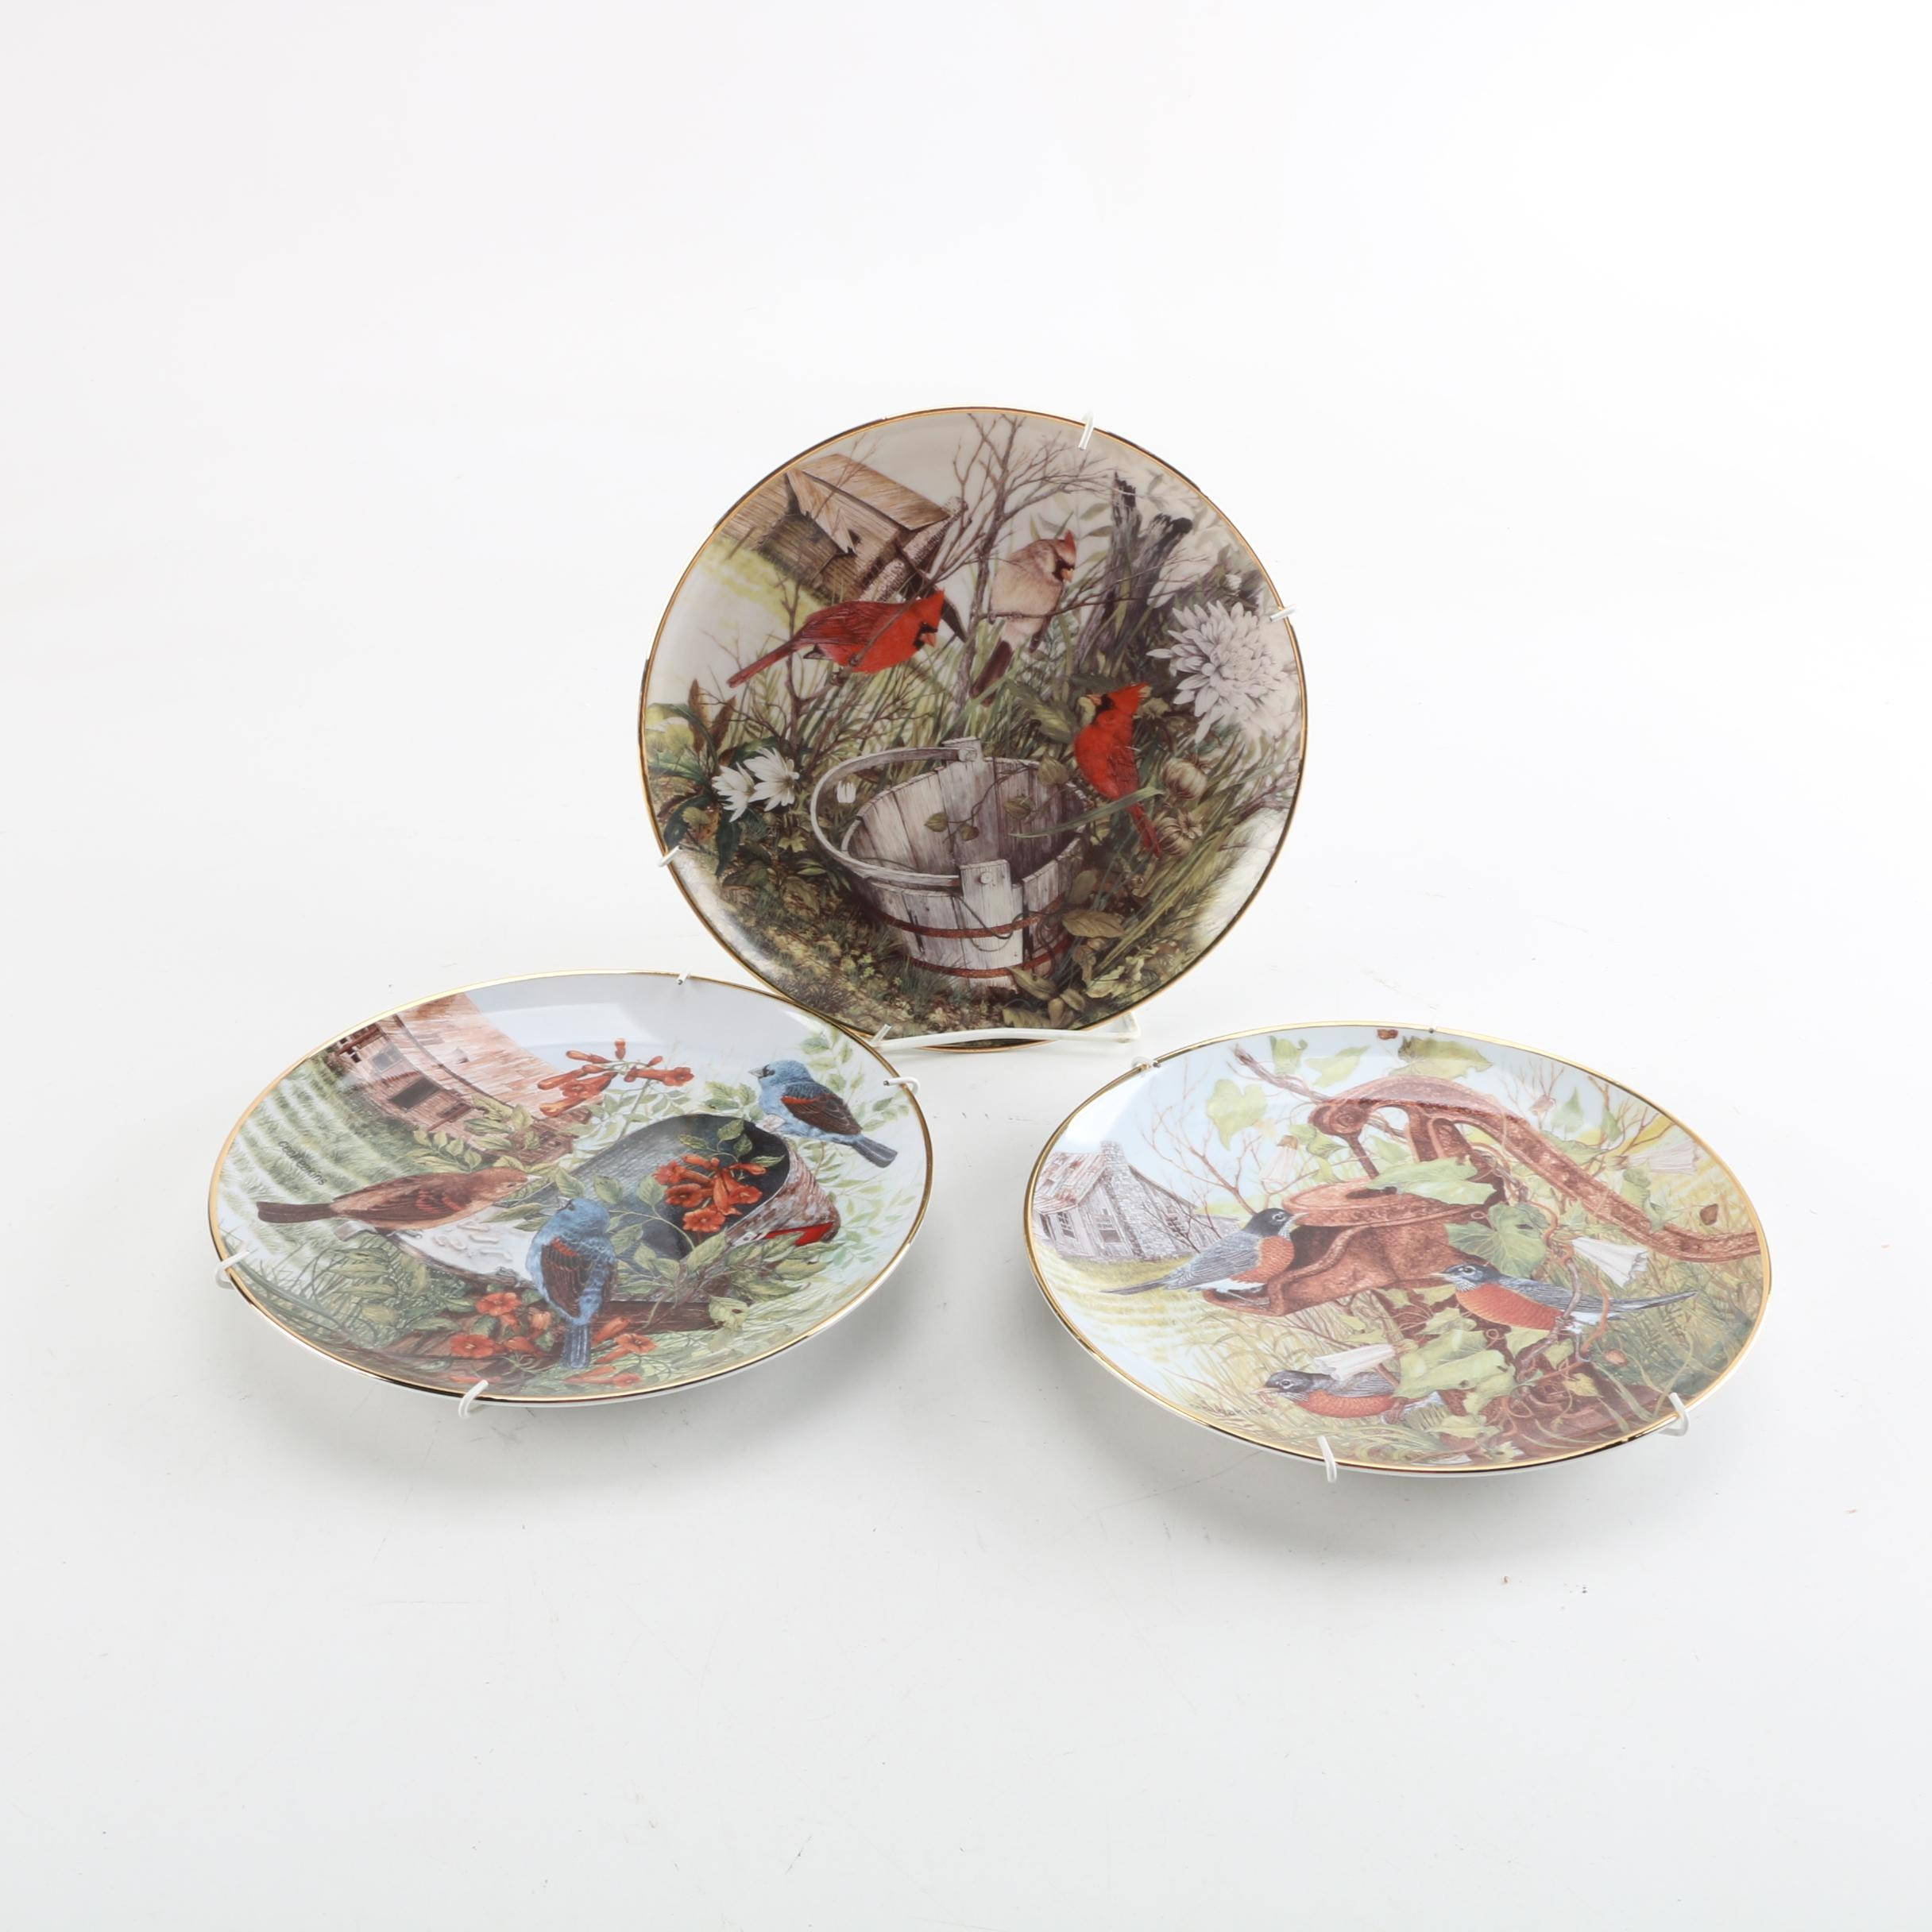 Franklin Mint Cecile Eakins Limited Edition Decorative Bird Plates